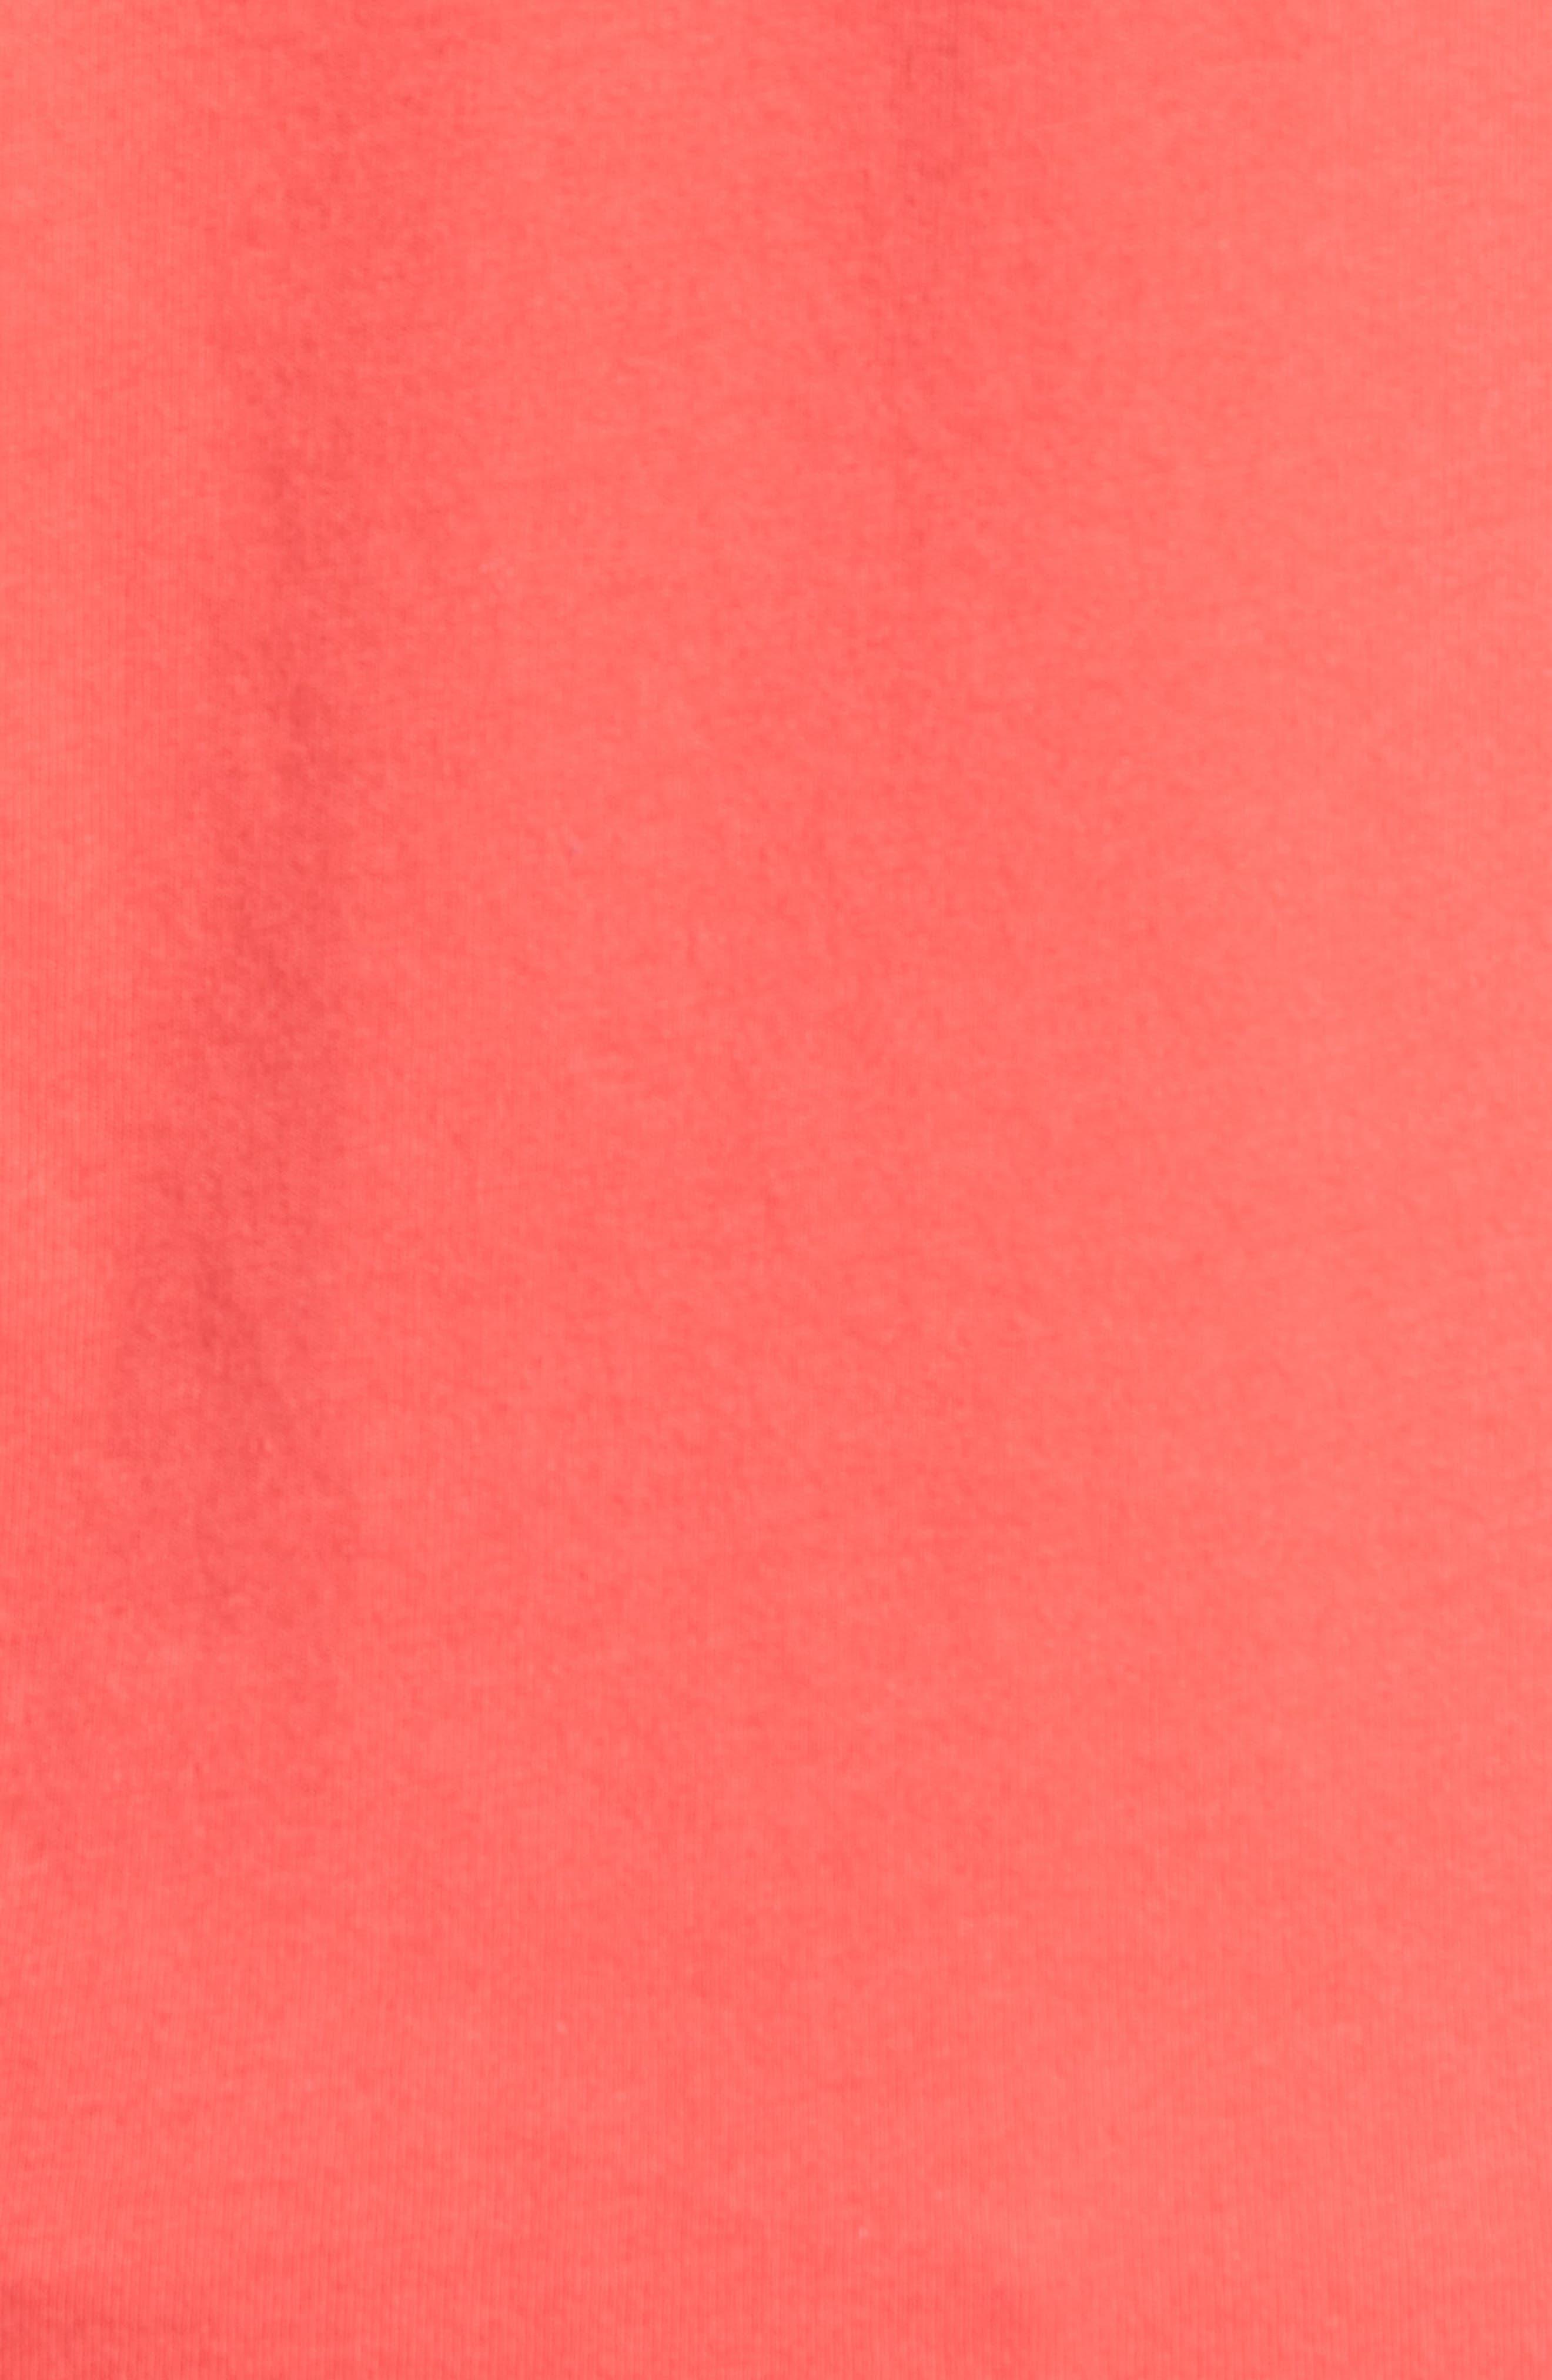 Grate Outdoors T-Shirt,                             Alternate thumbnail 5, color,                             Pomodoro